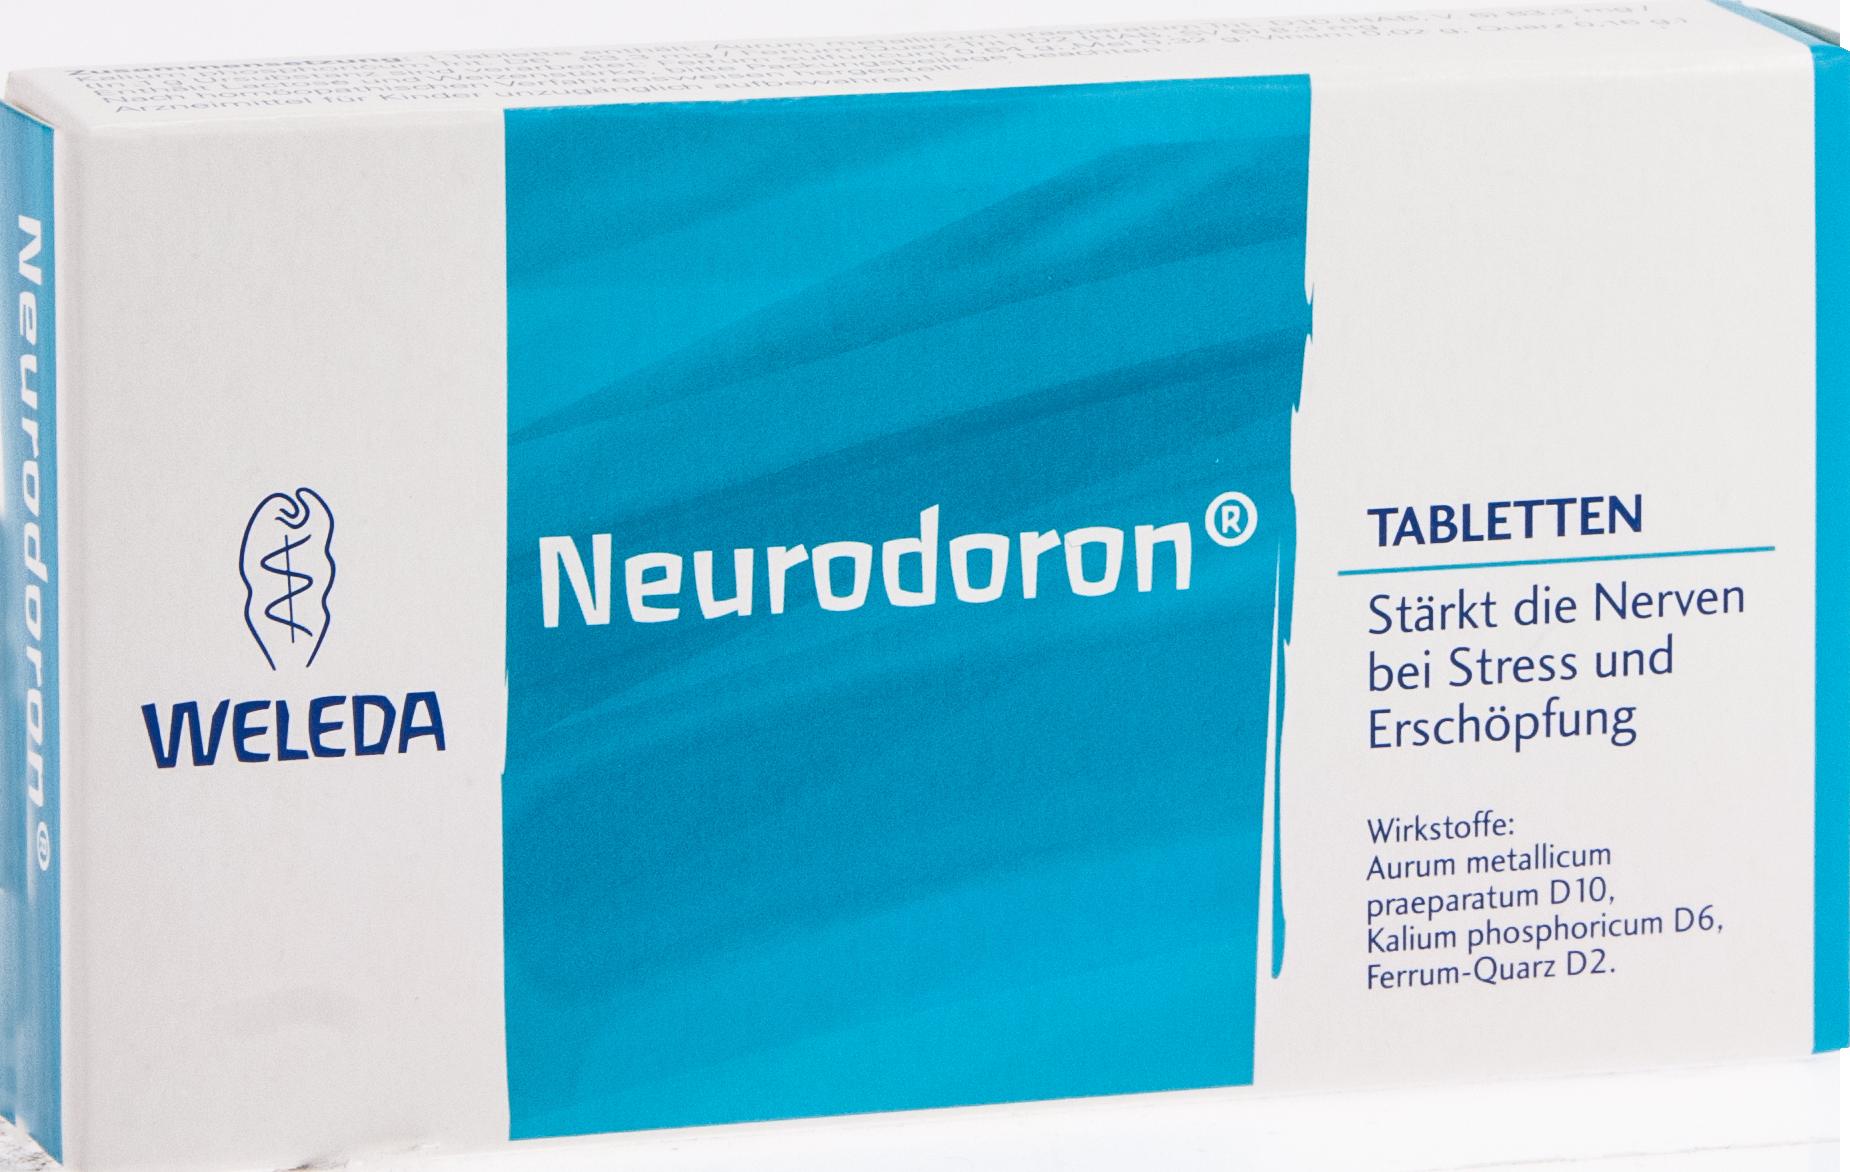 Neurodoron